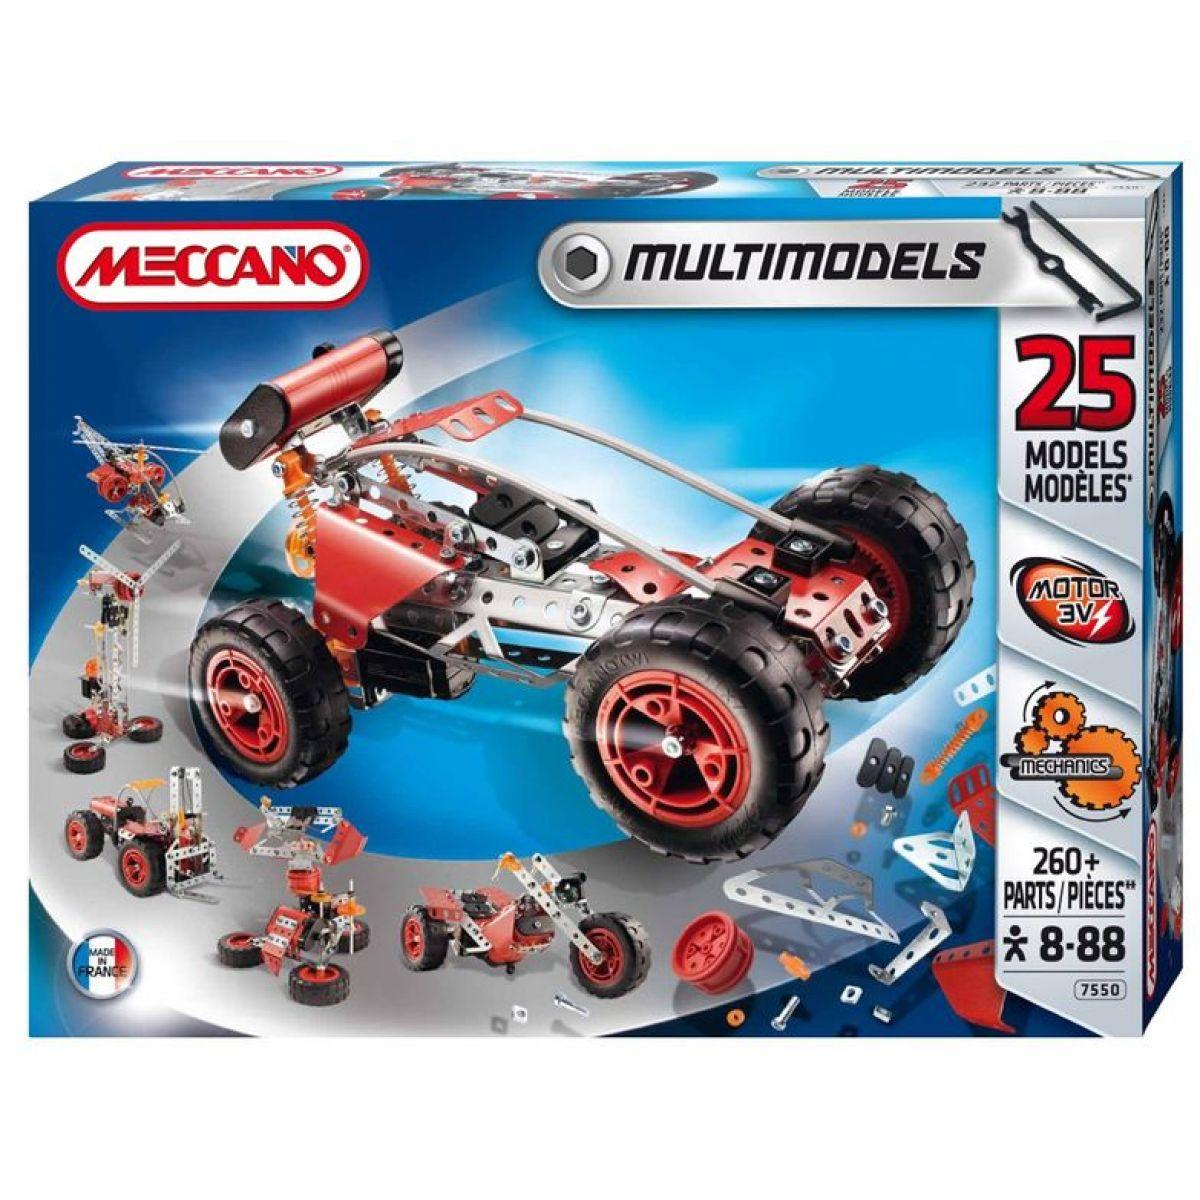 Meccano Multimodels25 643 dílů